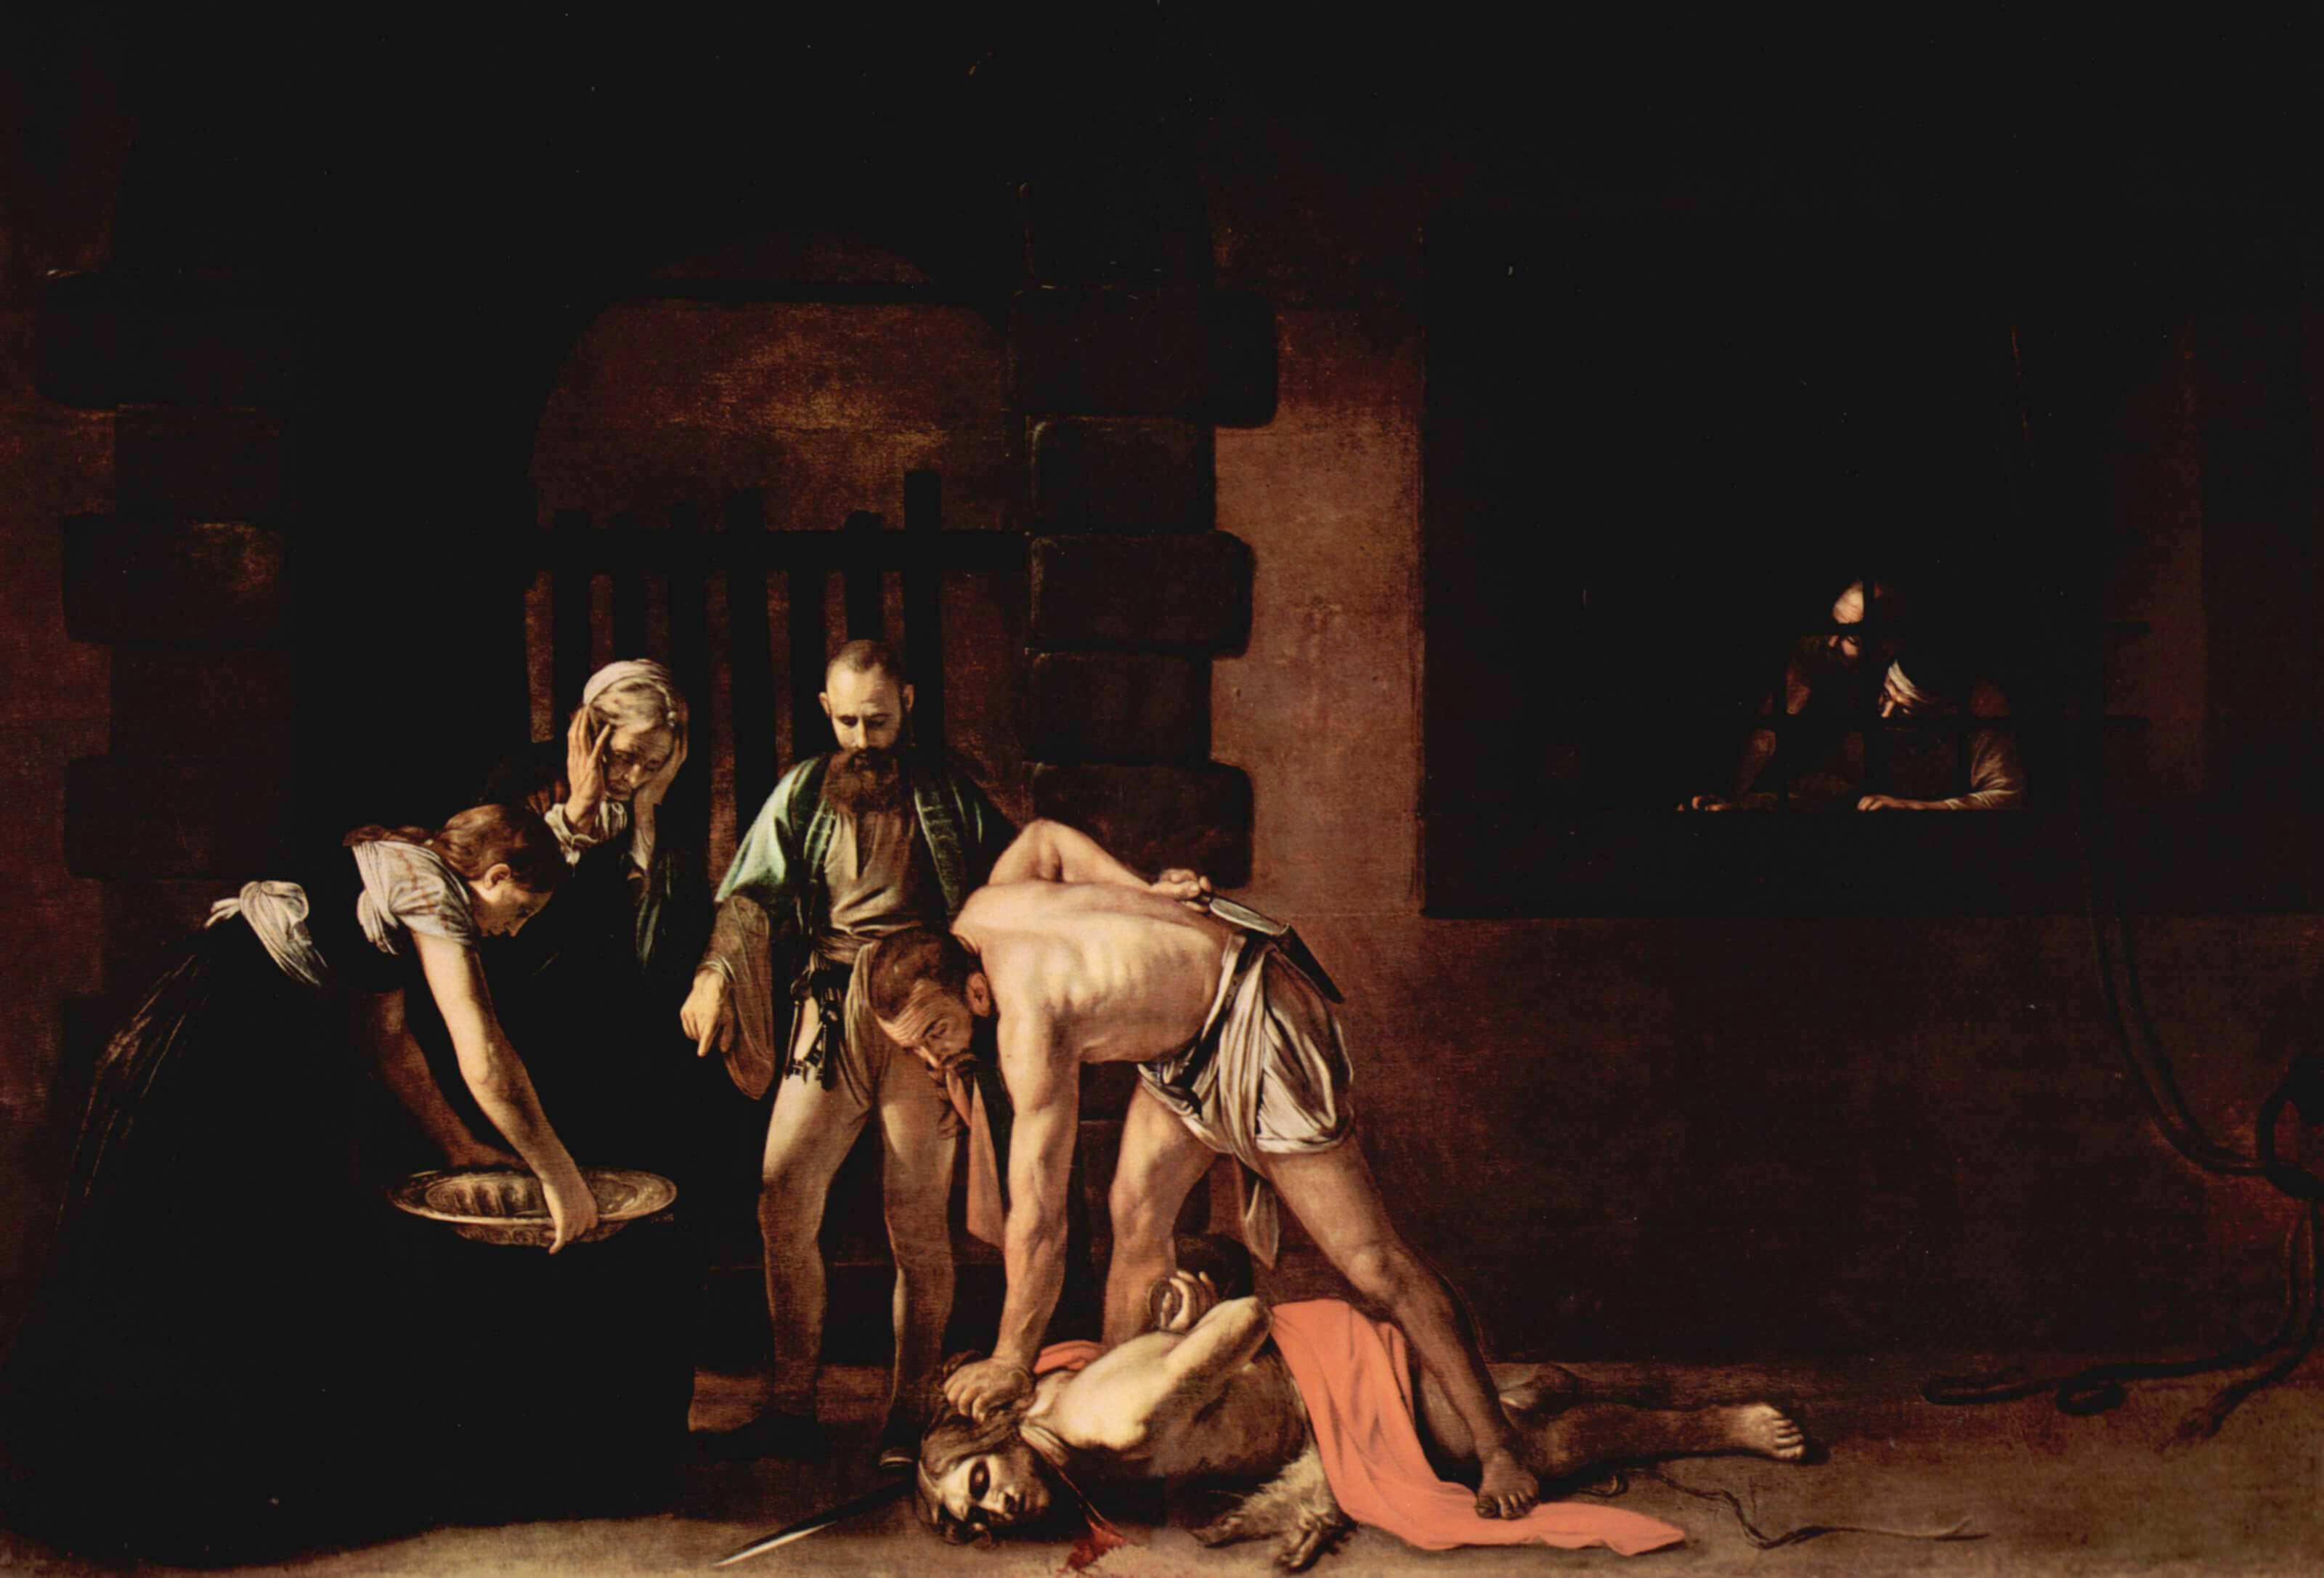 As Duas Faces de Caravaggio